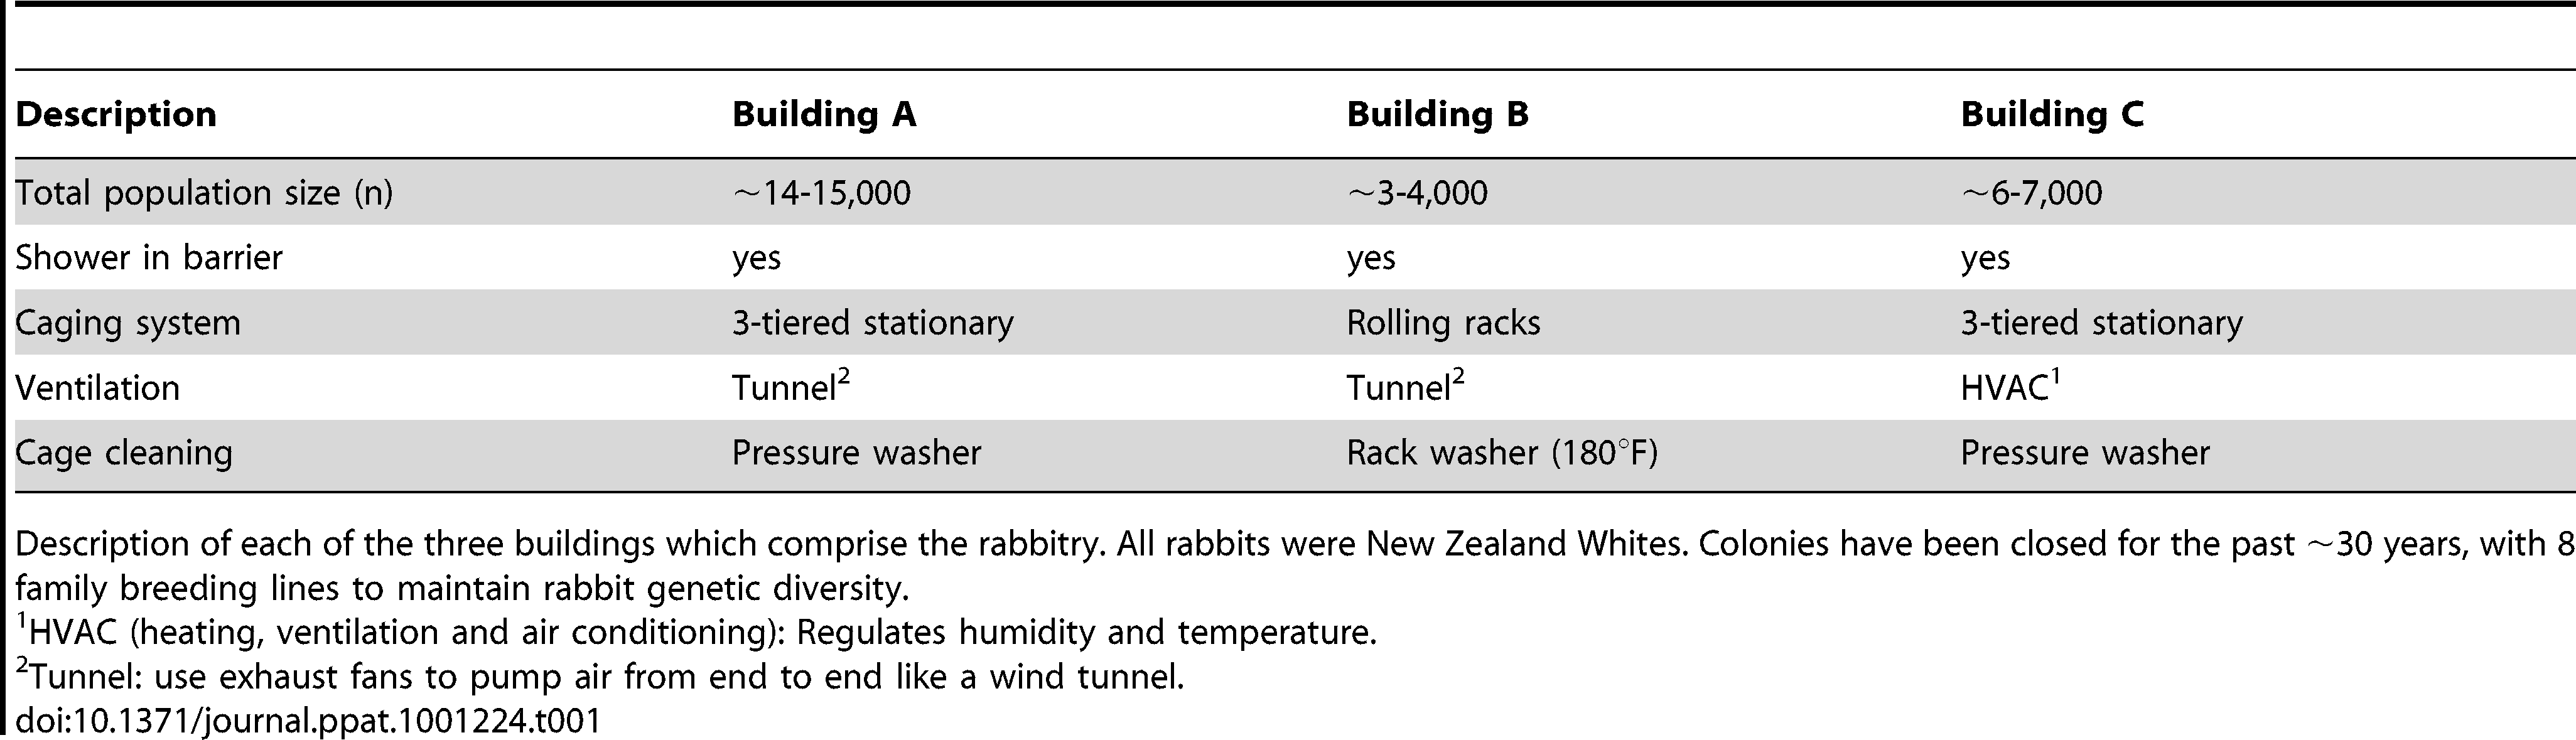 Rabbitry Buildings.